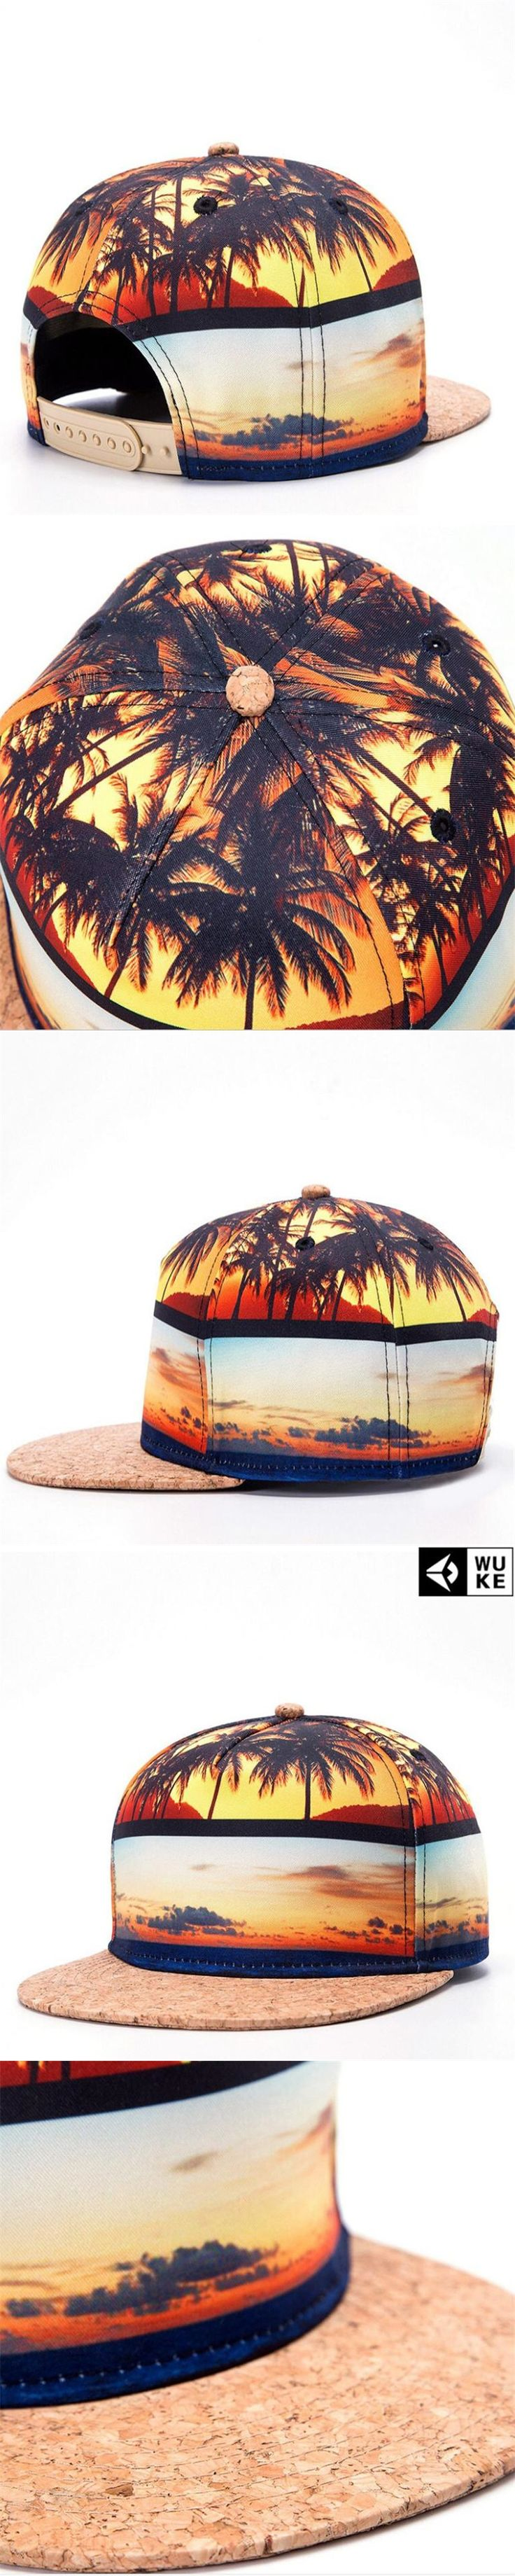 WuKe 2017 Summer Style Men Baseball Caps Hip Hop Snapback Hats Rock Caps Fashion Casquette Gorras Boen Snapback Caps